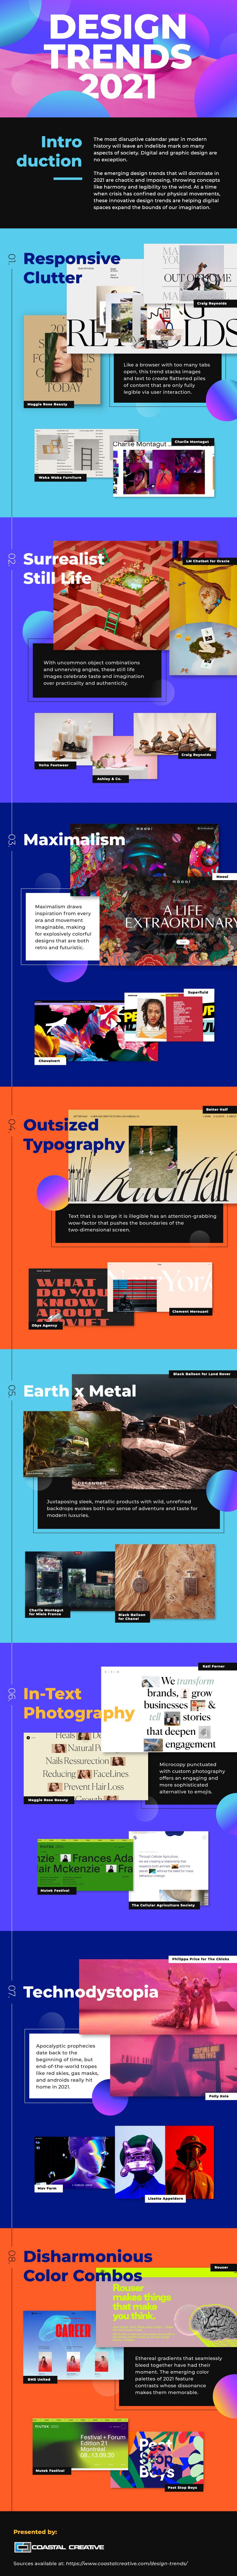 8 Huge Design Trends For 2021 Revealed Creative Bloq